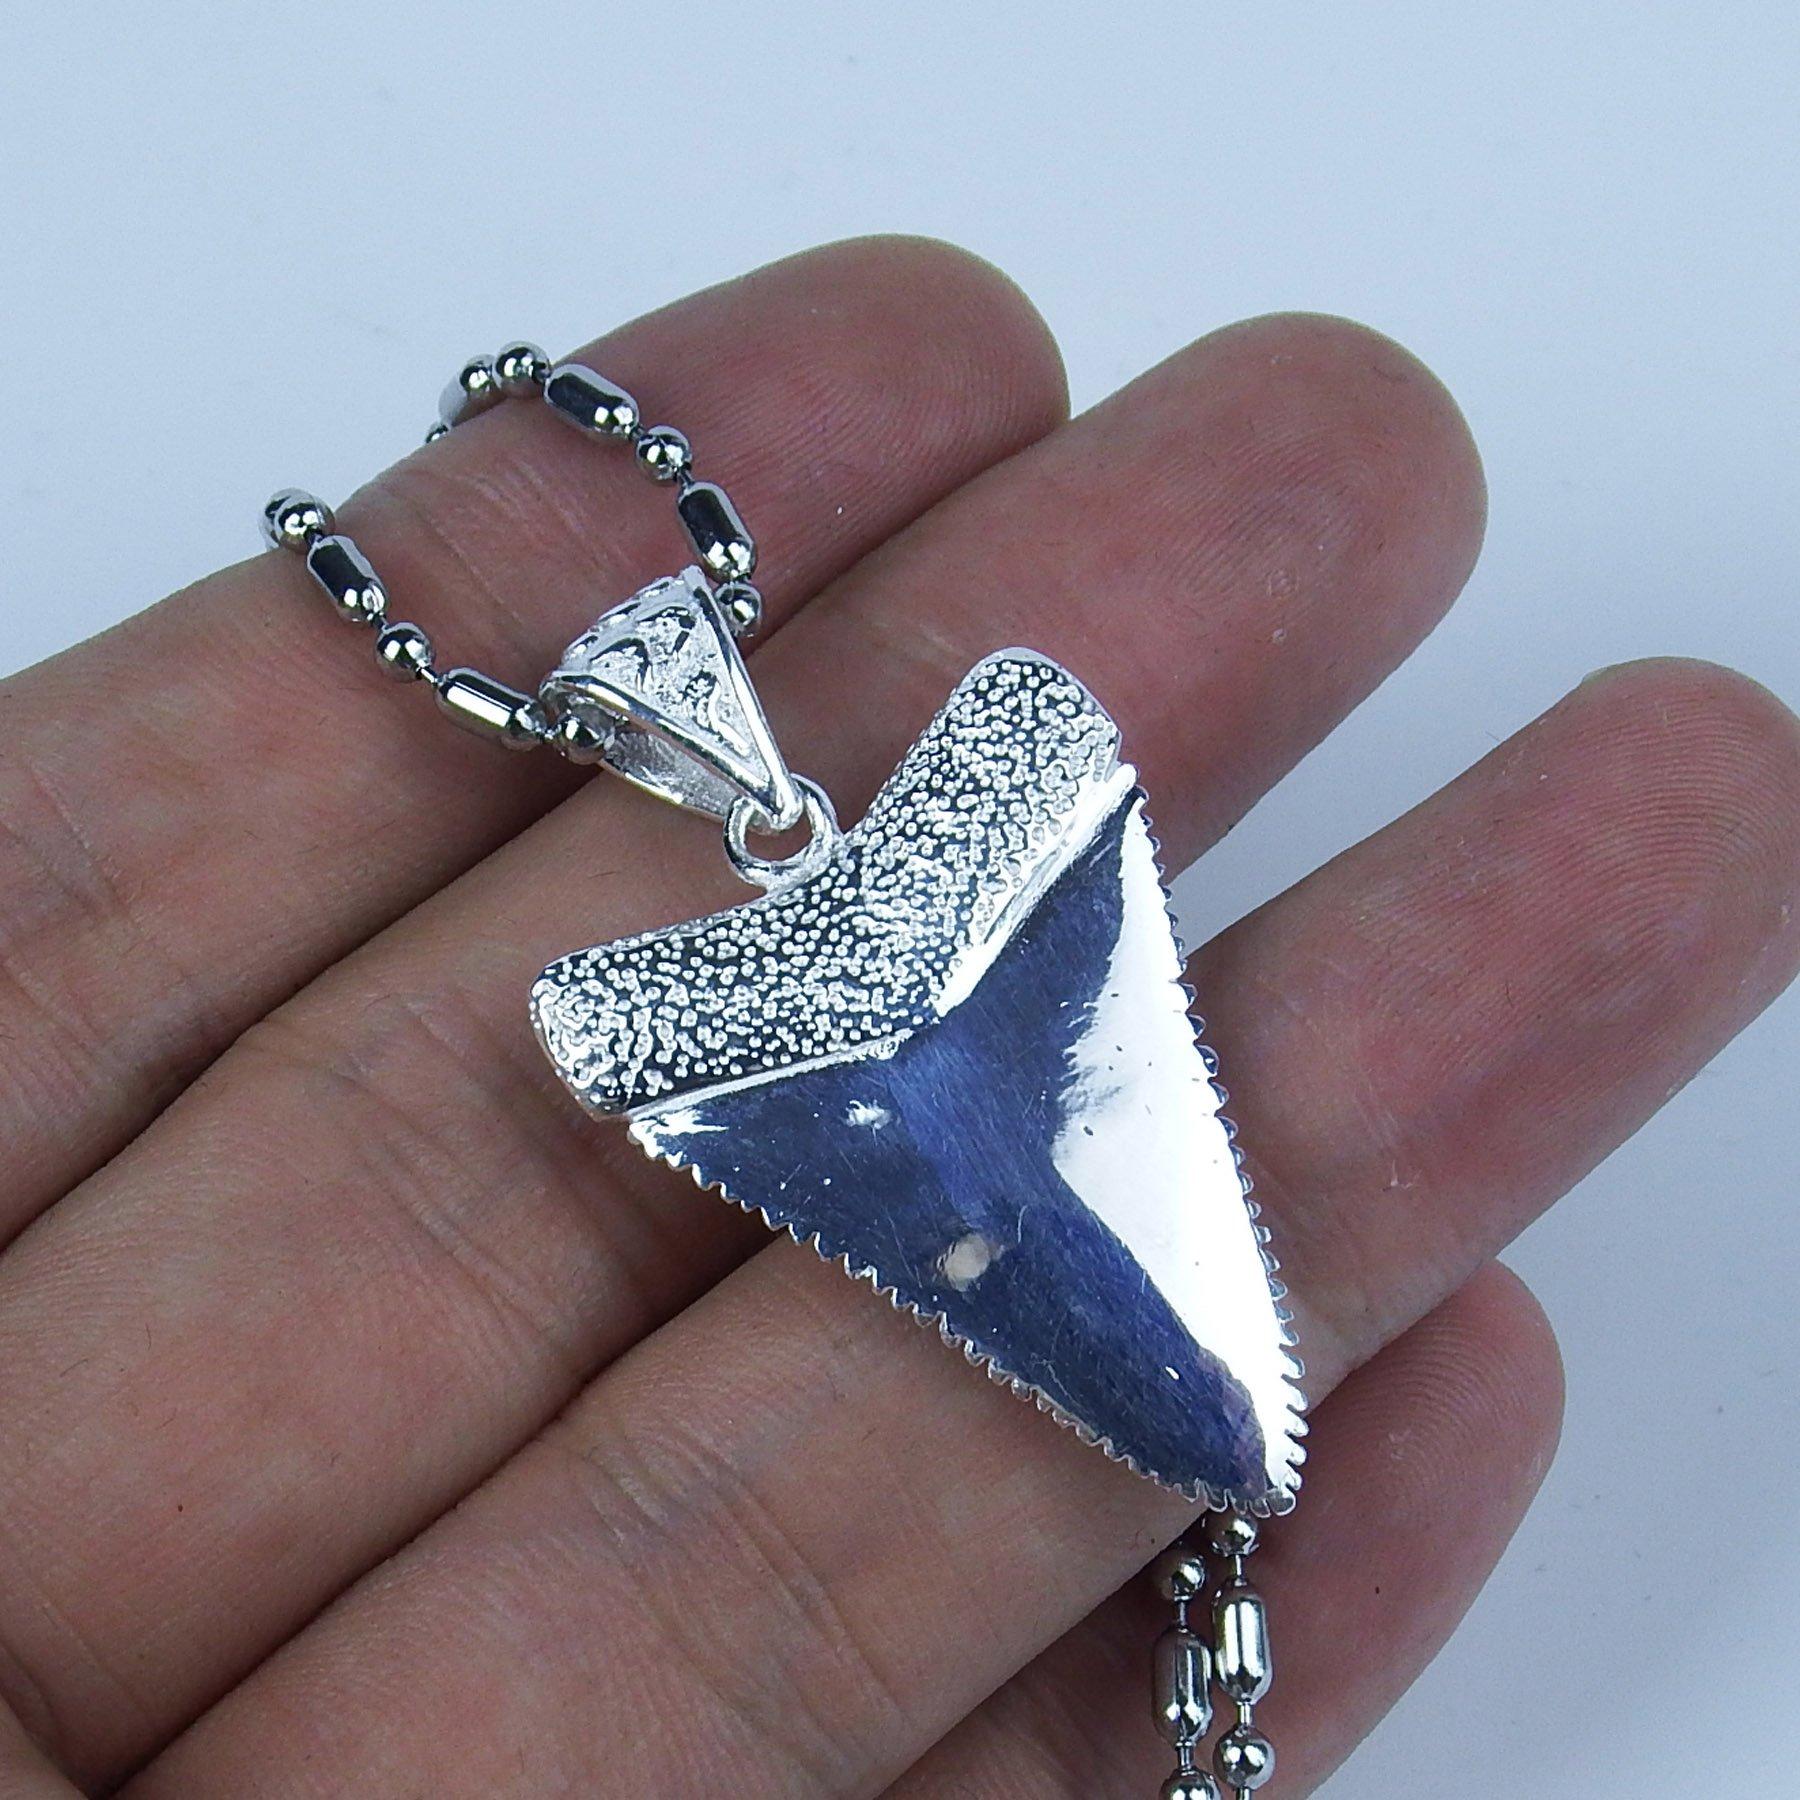 GemShark 15g Sterling Silver Necklace Pendant Great White Shark Tooth for Men Women by GemShark (Image #7)